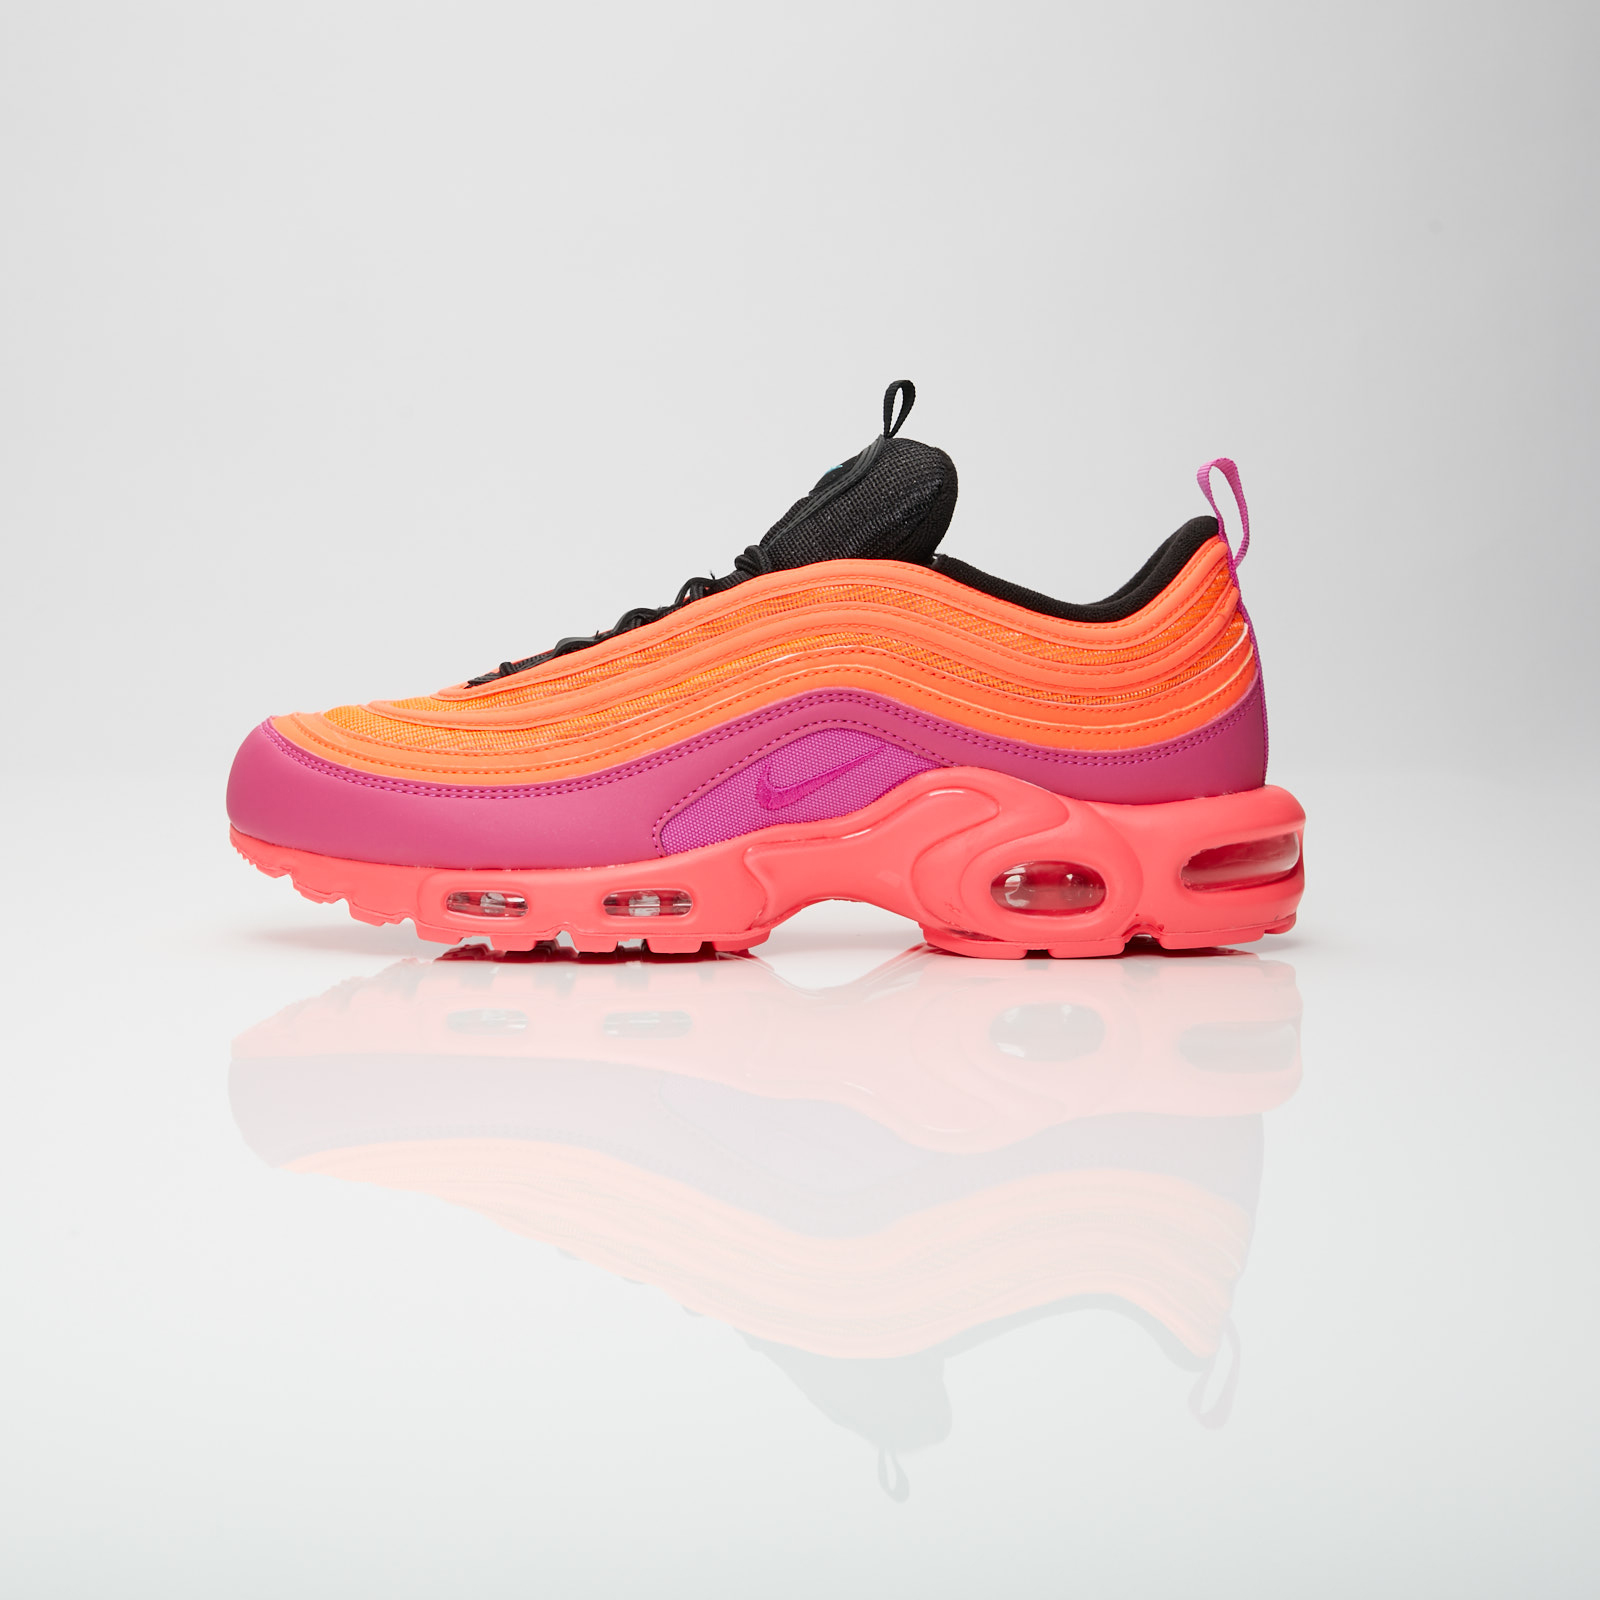 Nike Air Max Plus 97 Ah8143 600 Sneakersnstuff I Sneakers